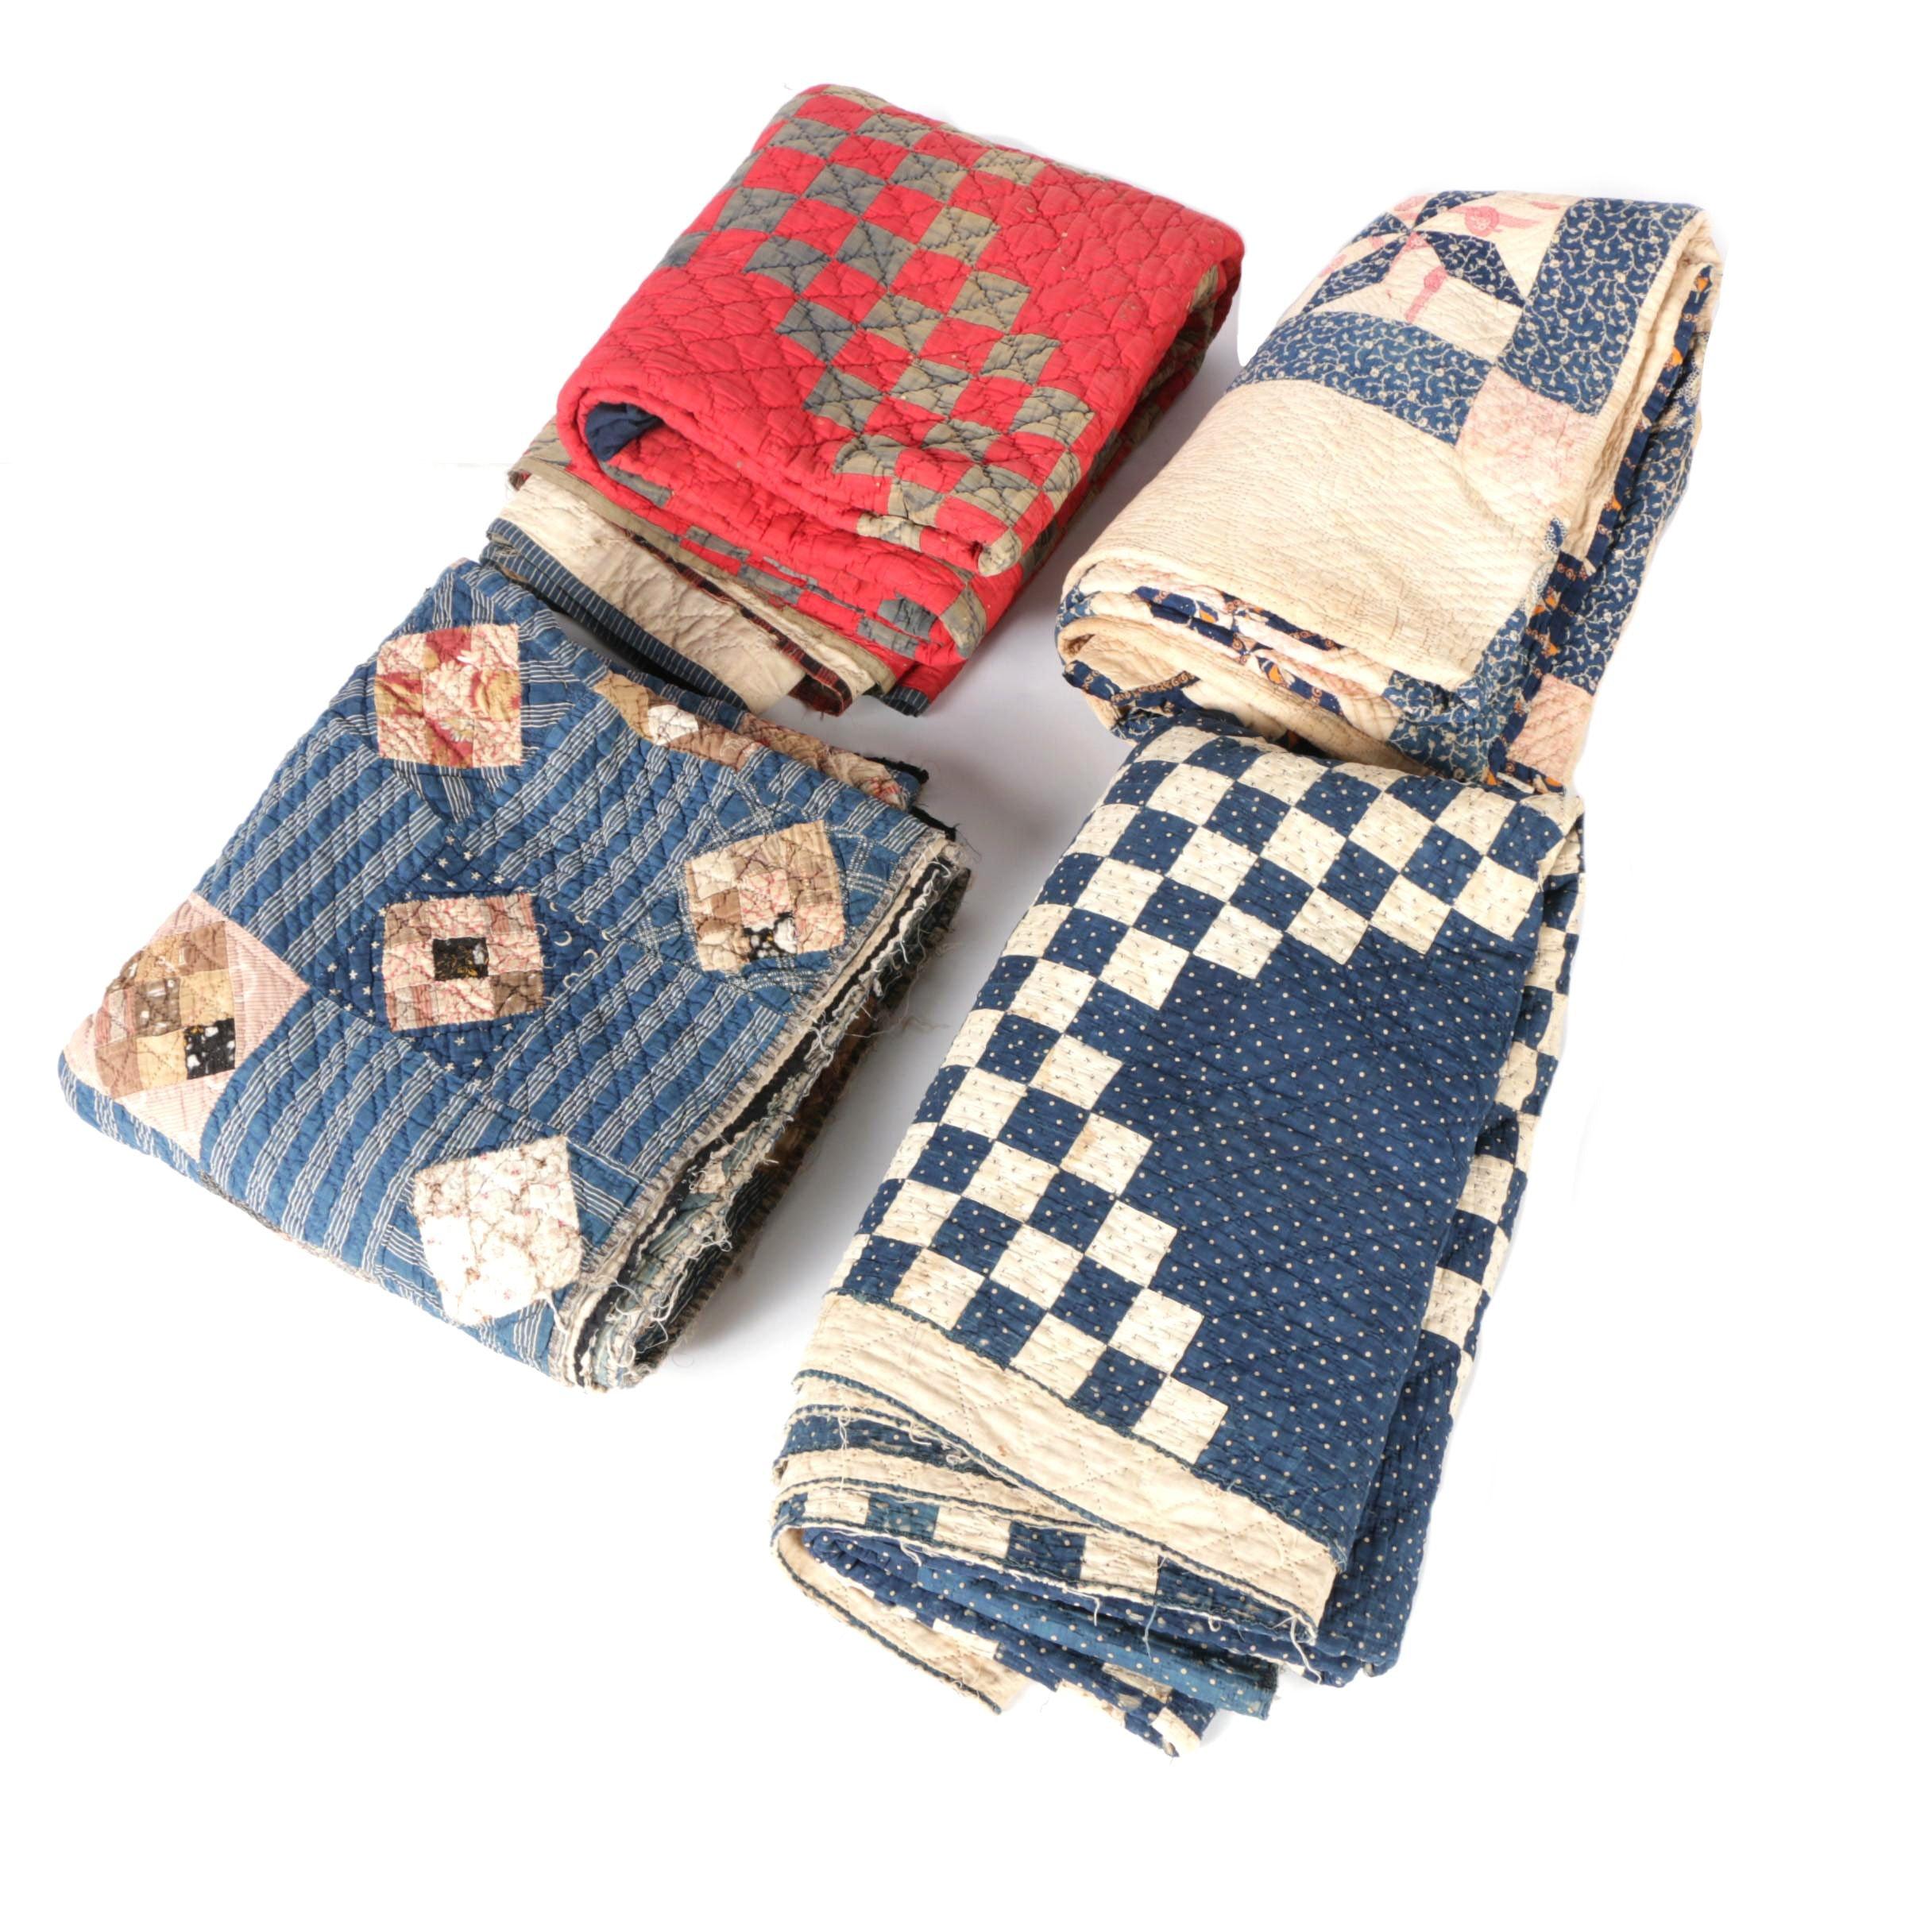 Antique Handmade Quilts